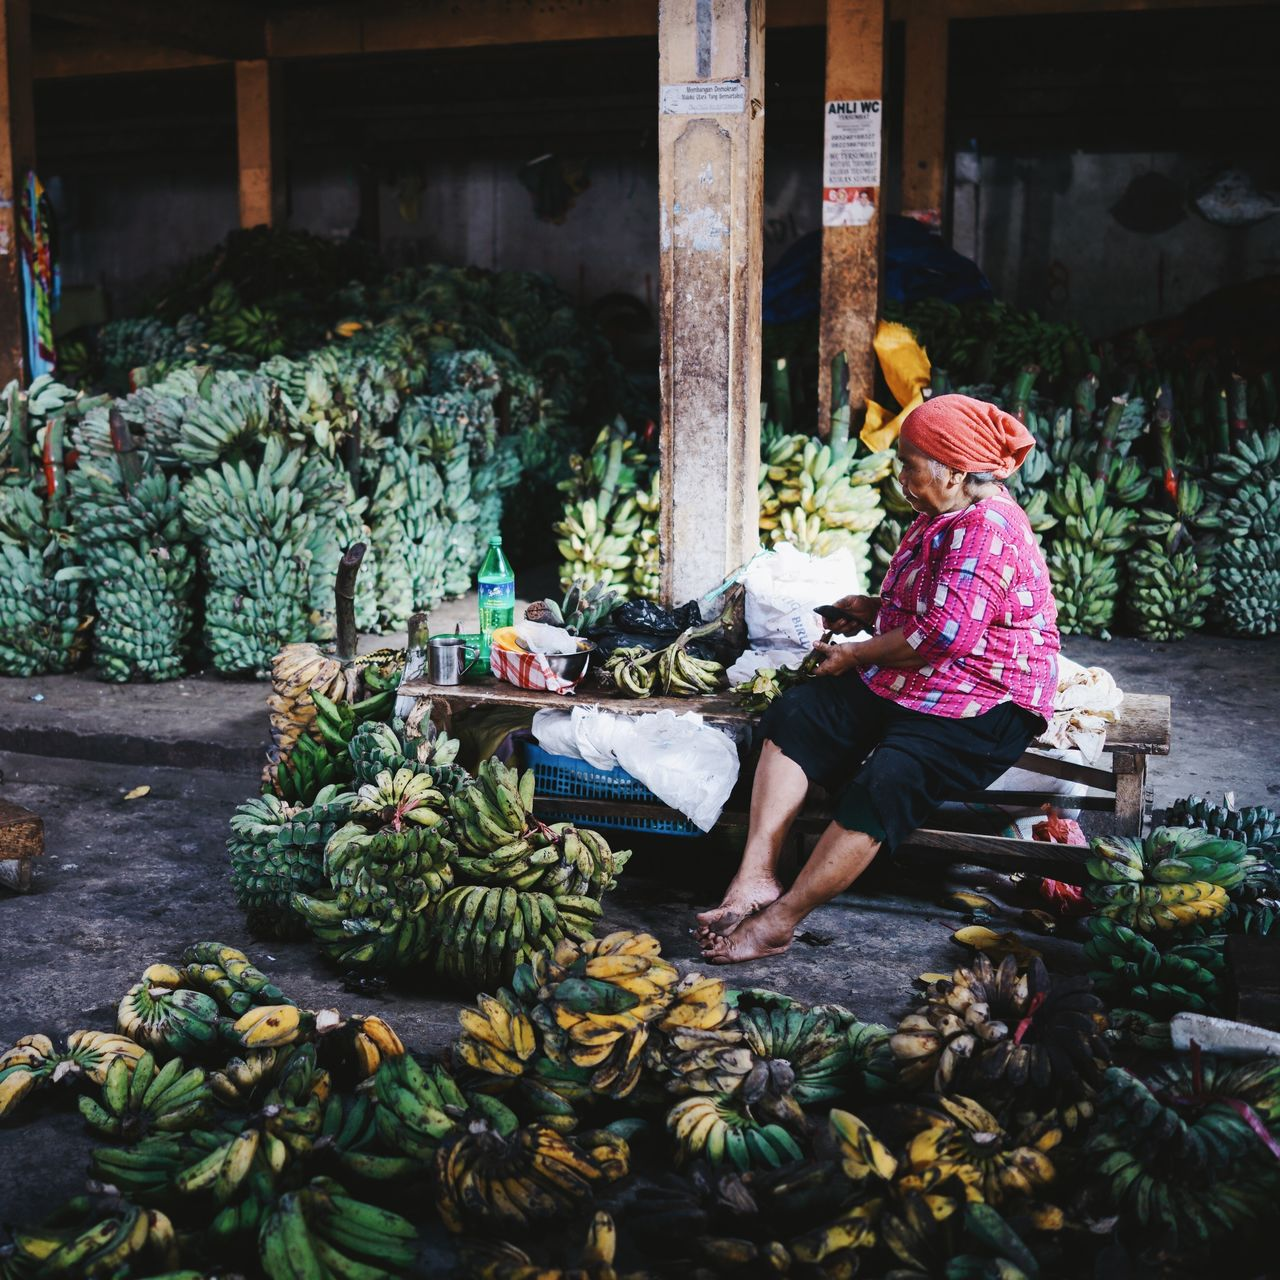 ASIA Bananas Day Fruits Green Bananas INDONESIA Indoors  Maluku  Market Old Woman Portrait Retail  Selling Selling Banana Sitting Ternate Traveling Woman Women Yellow Bananas The Portraitist - 2017 EyeEm Awards The Photojournalist - 2017 EyeEm Awards